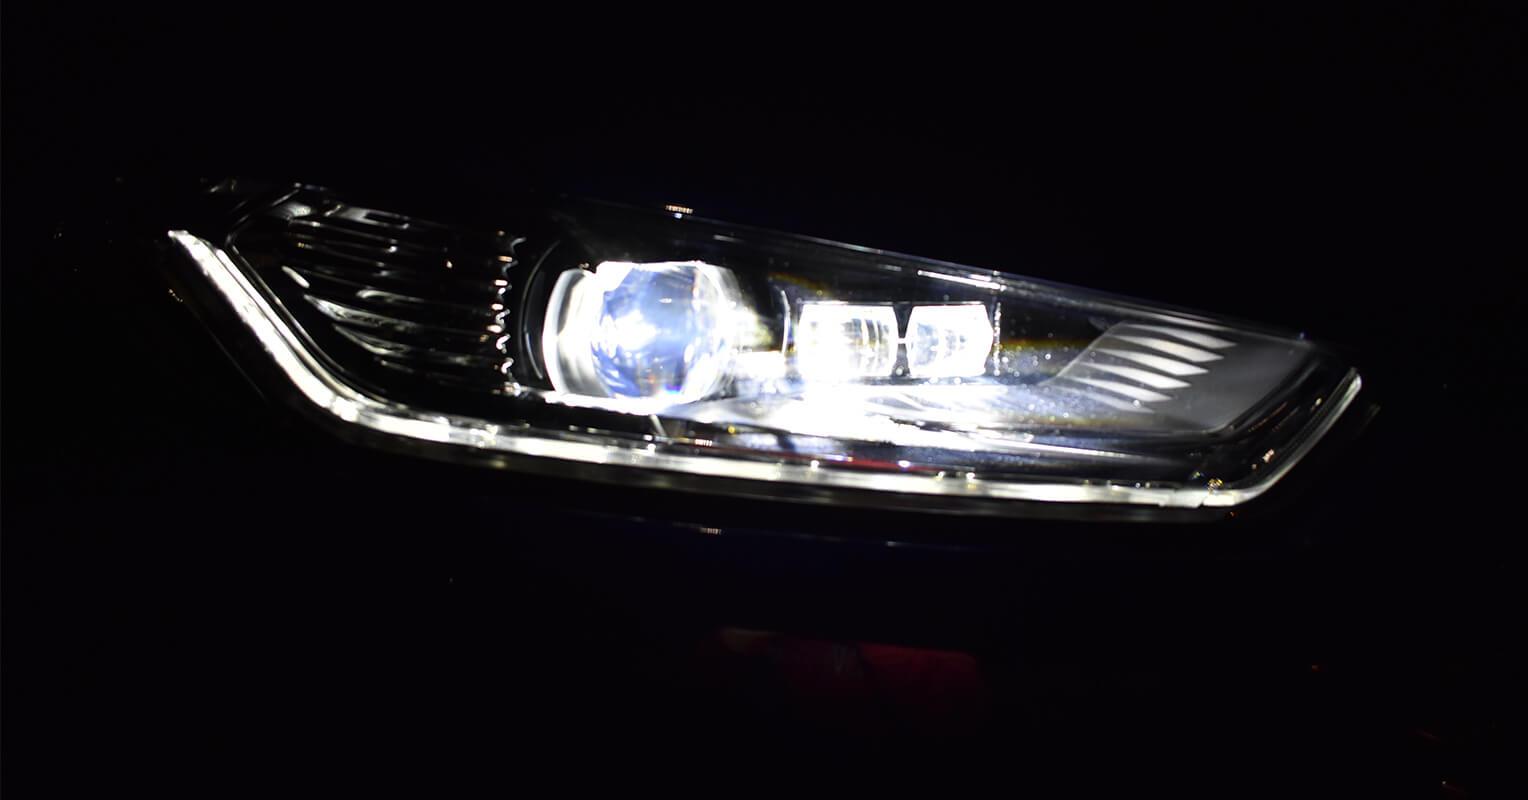 Faro delantero del Ford Mondeo híbrido